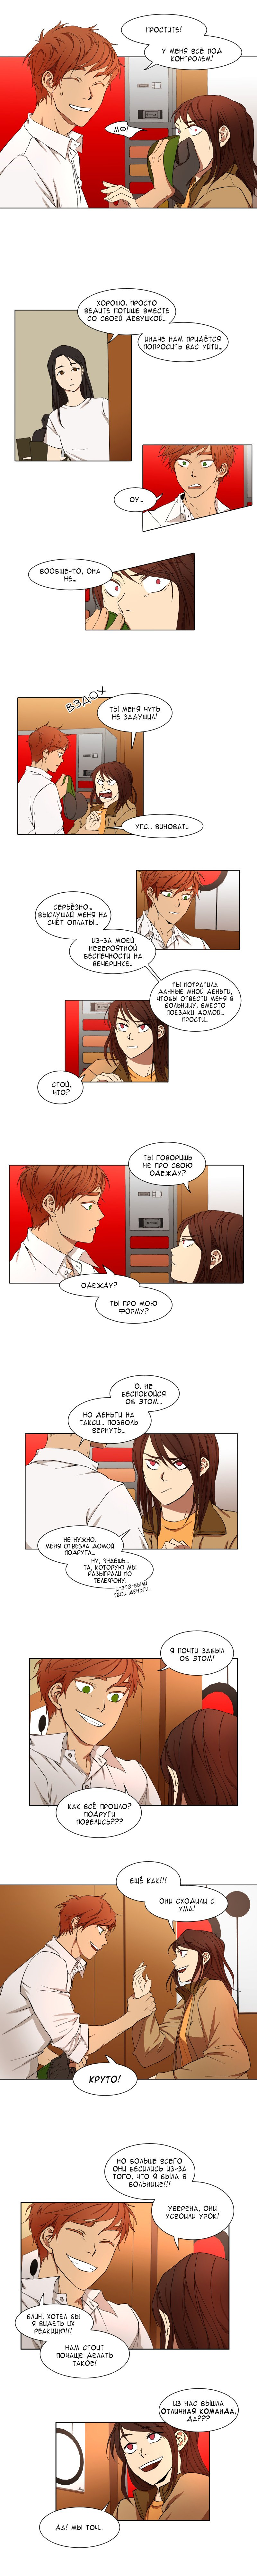 Манга Я люблю Ю / I love Yoo  - Том 1 Глава 11 Страница 3